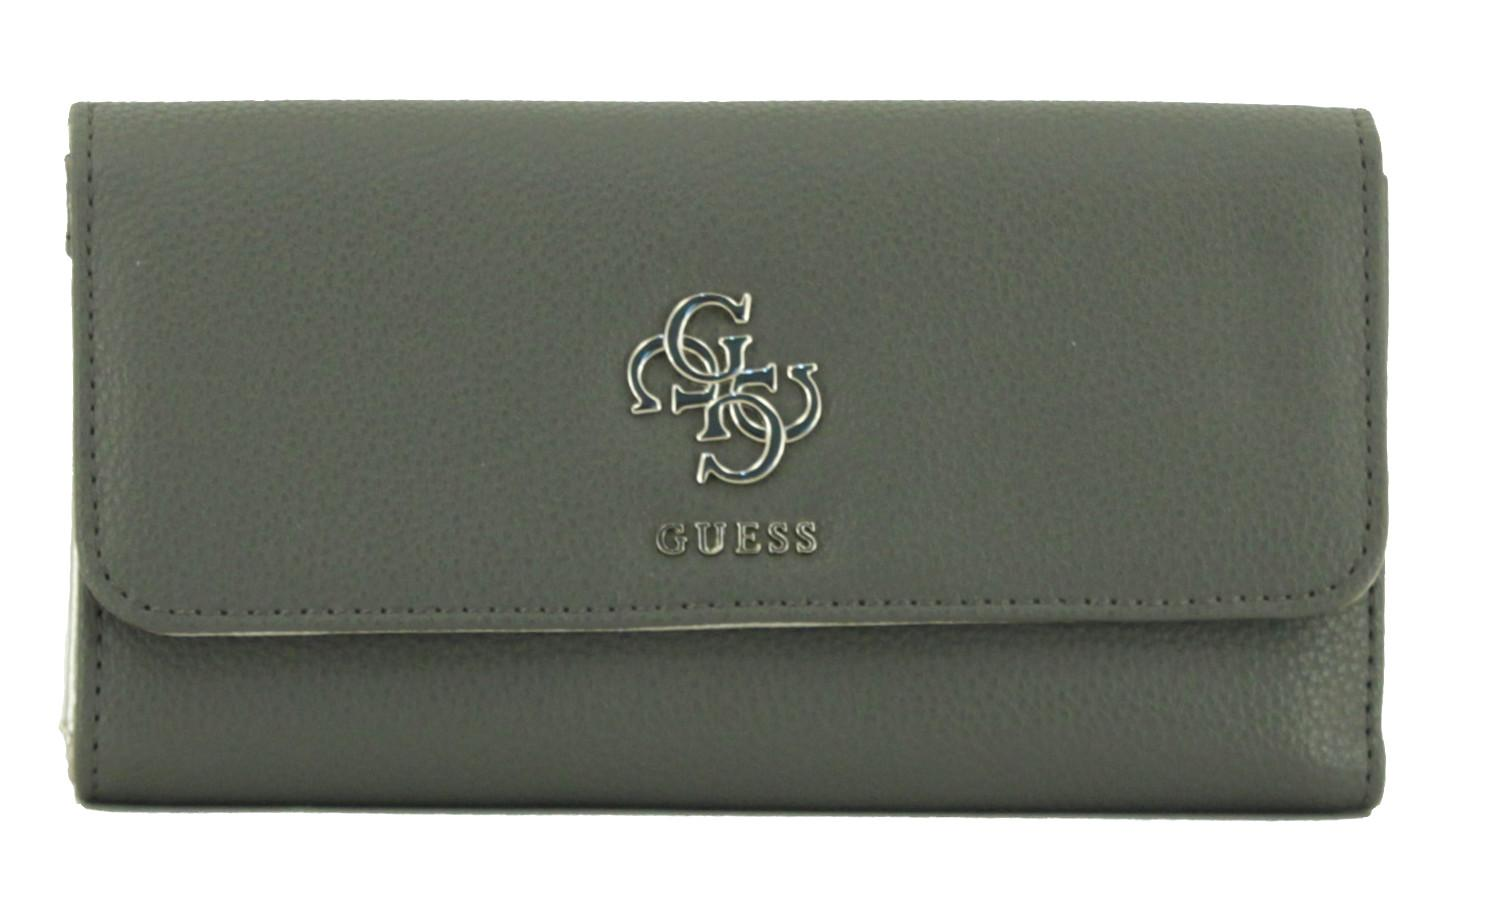 Guess Damenbrieftasche Digital Taupe grau gold 4G Emblem